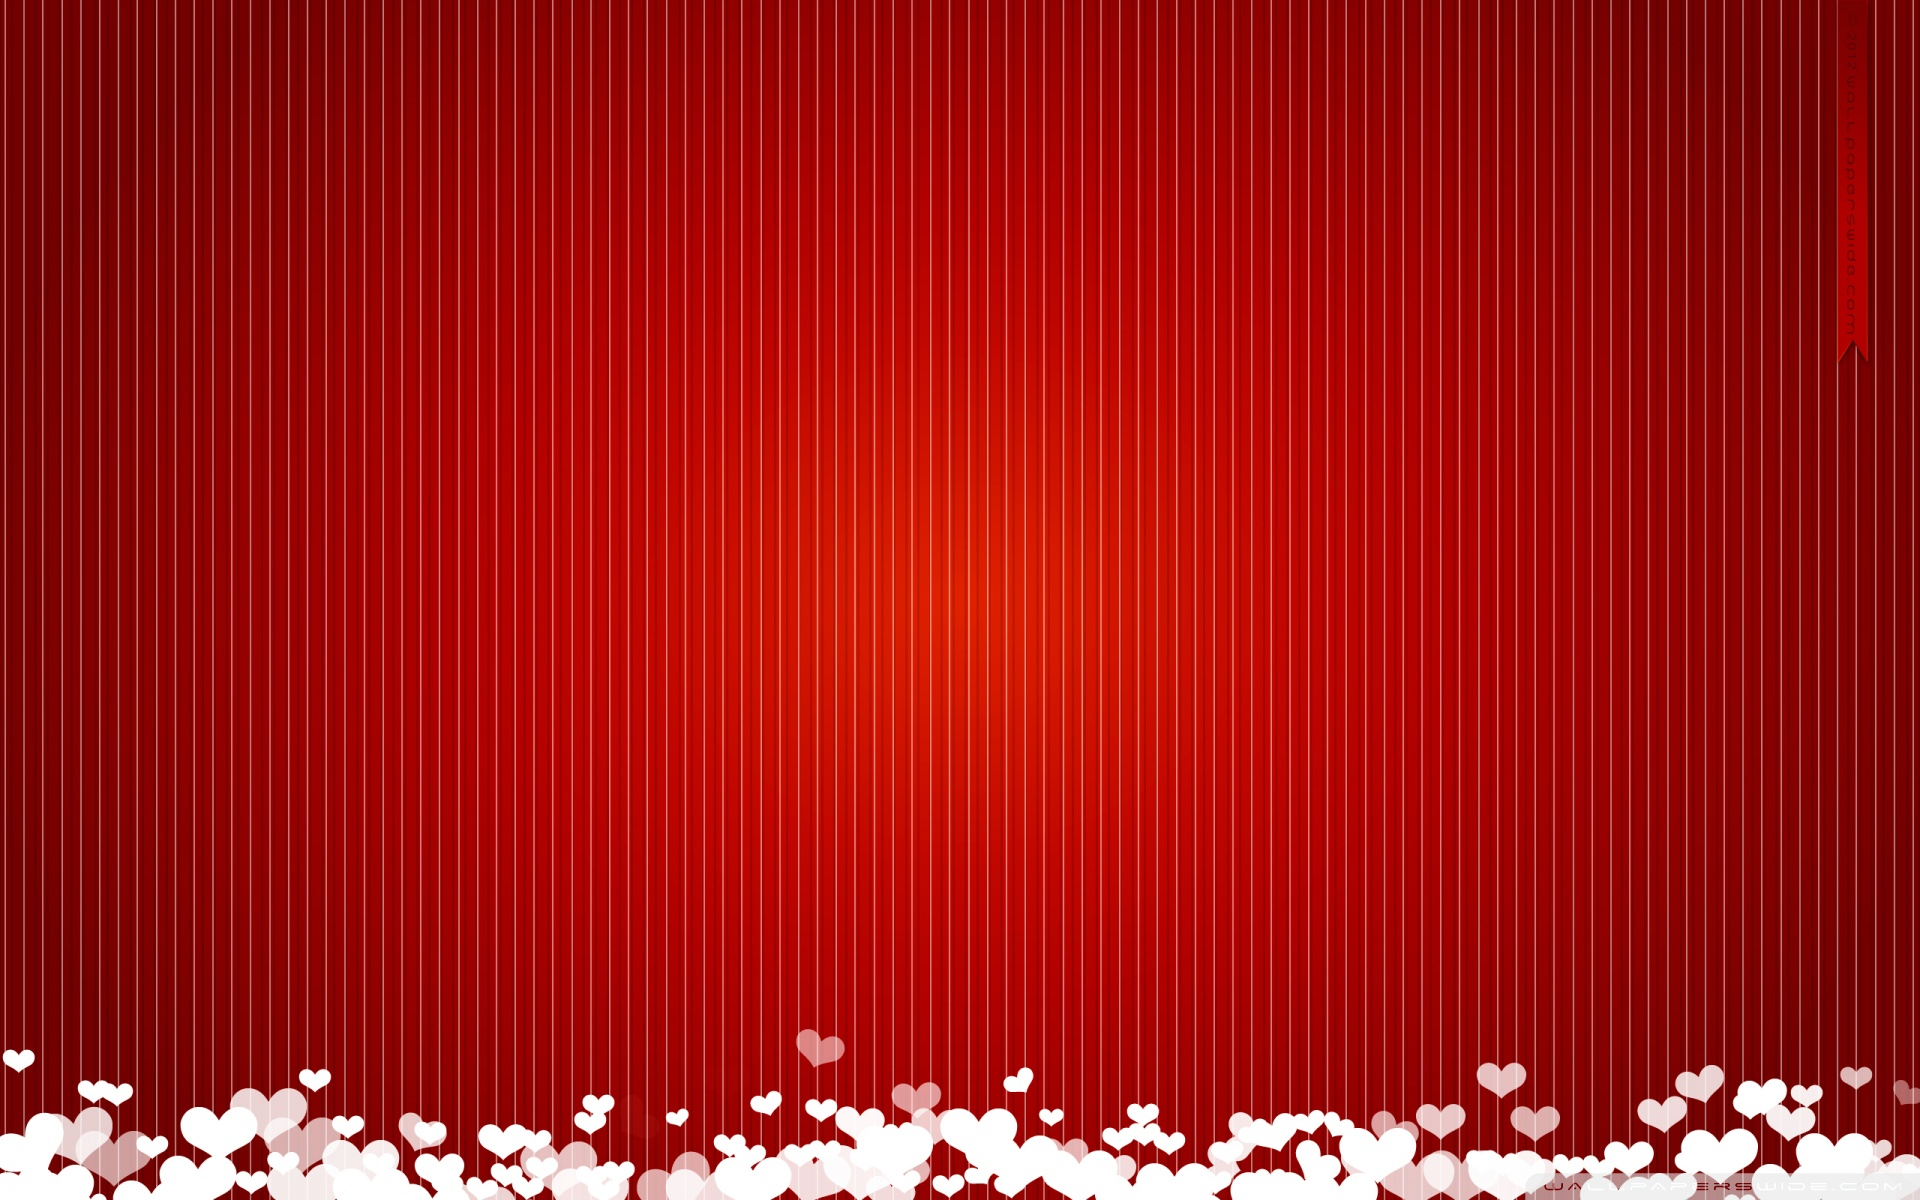 Valentine Background Images - WallpaperSafari